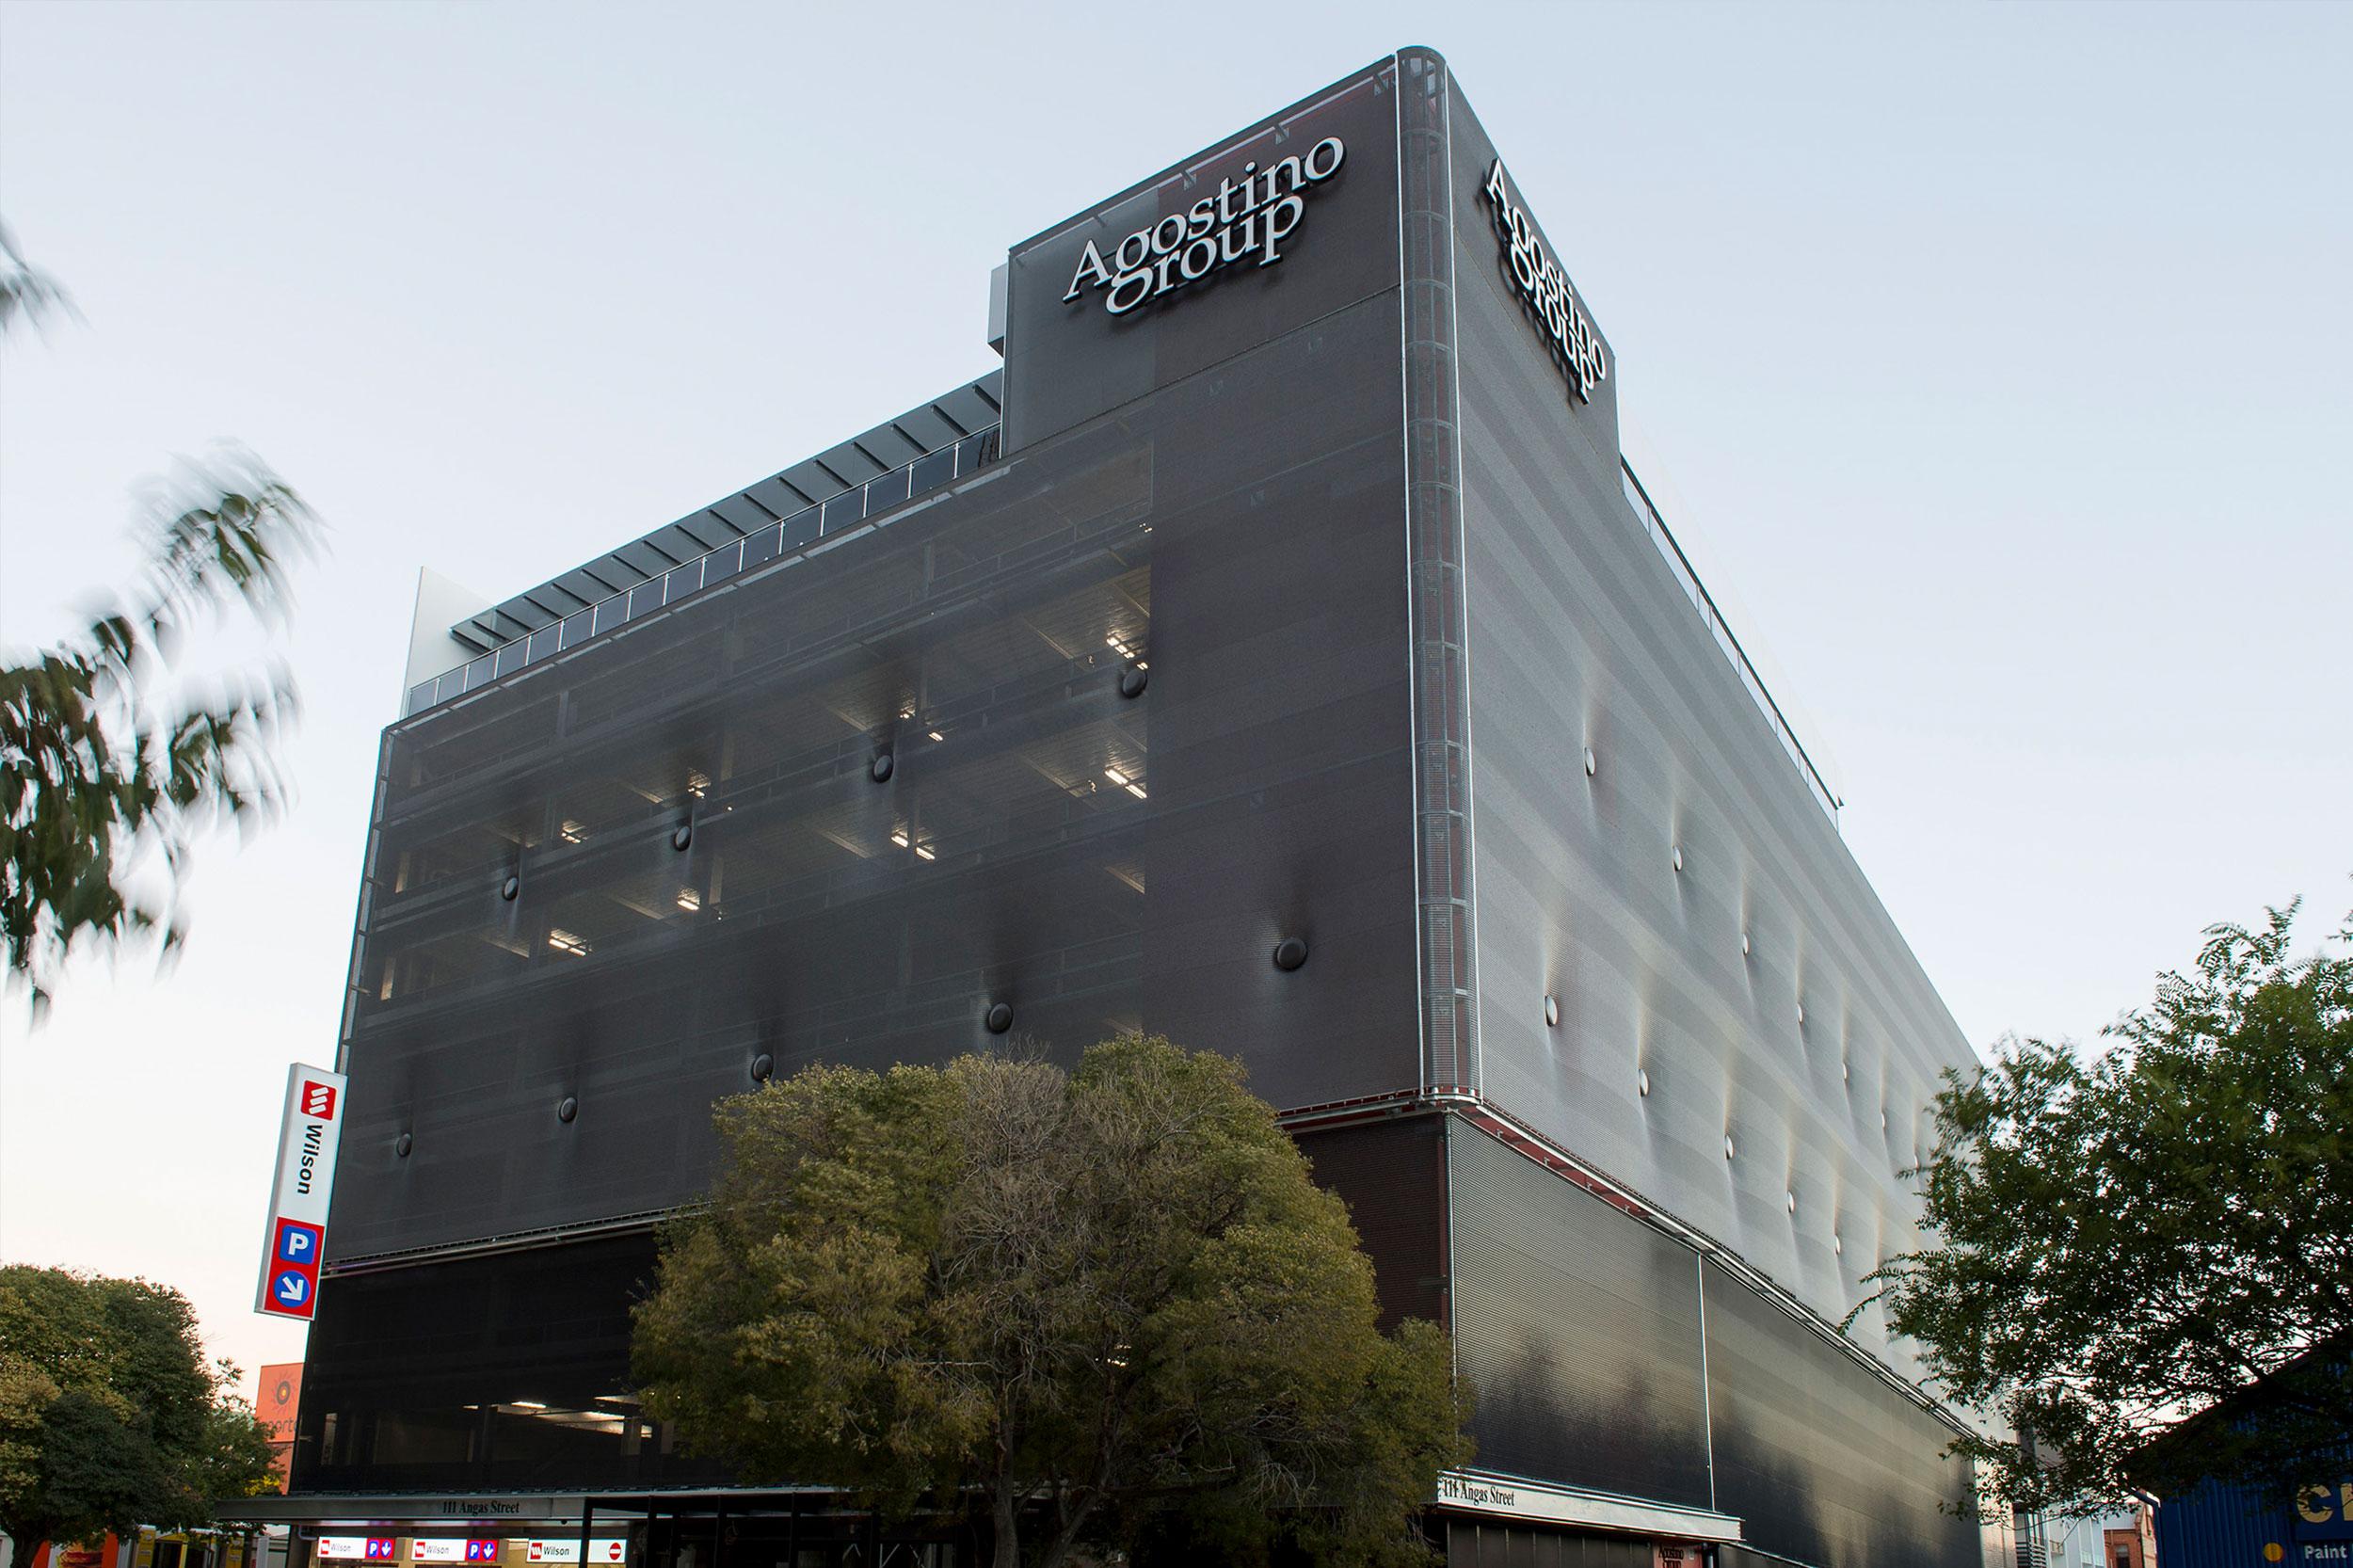 Agostino Group car park facade with Kaynemaile-Armour